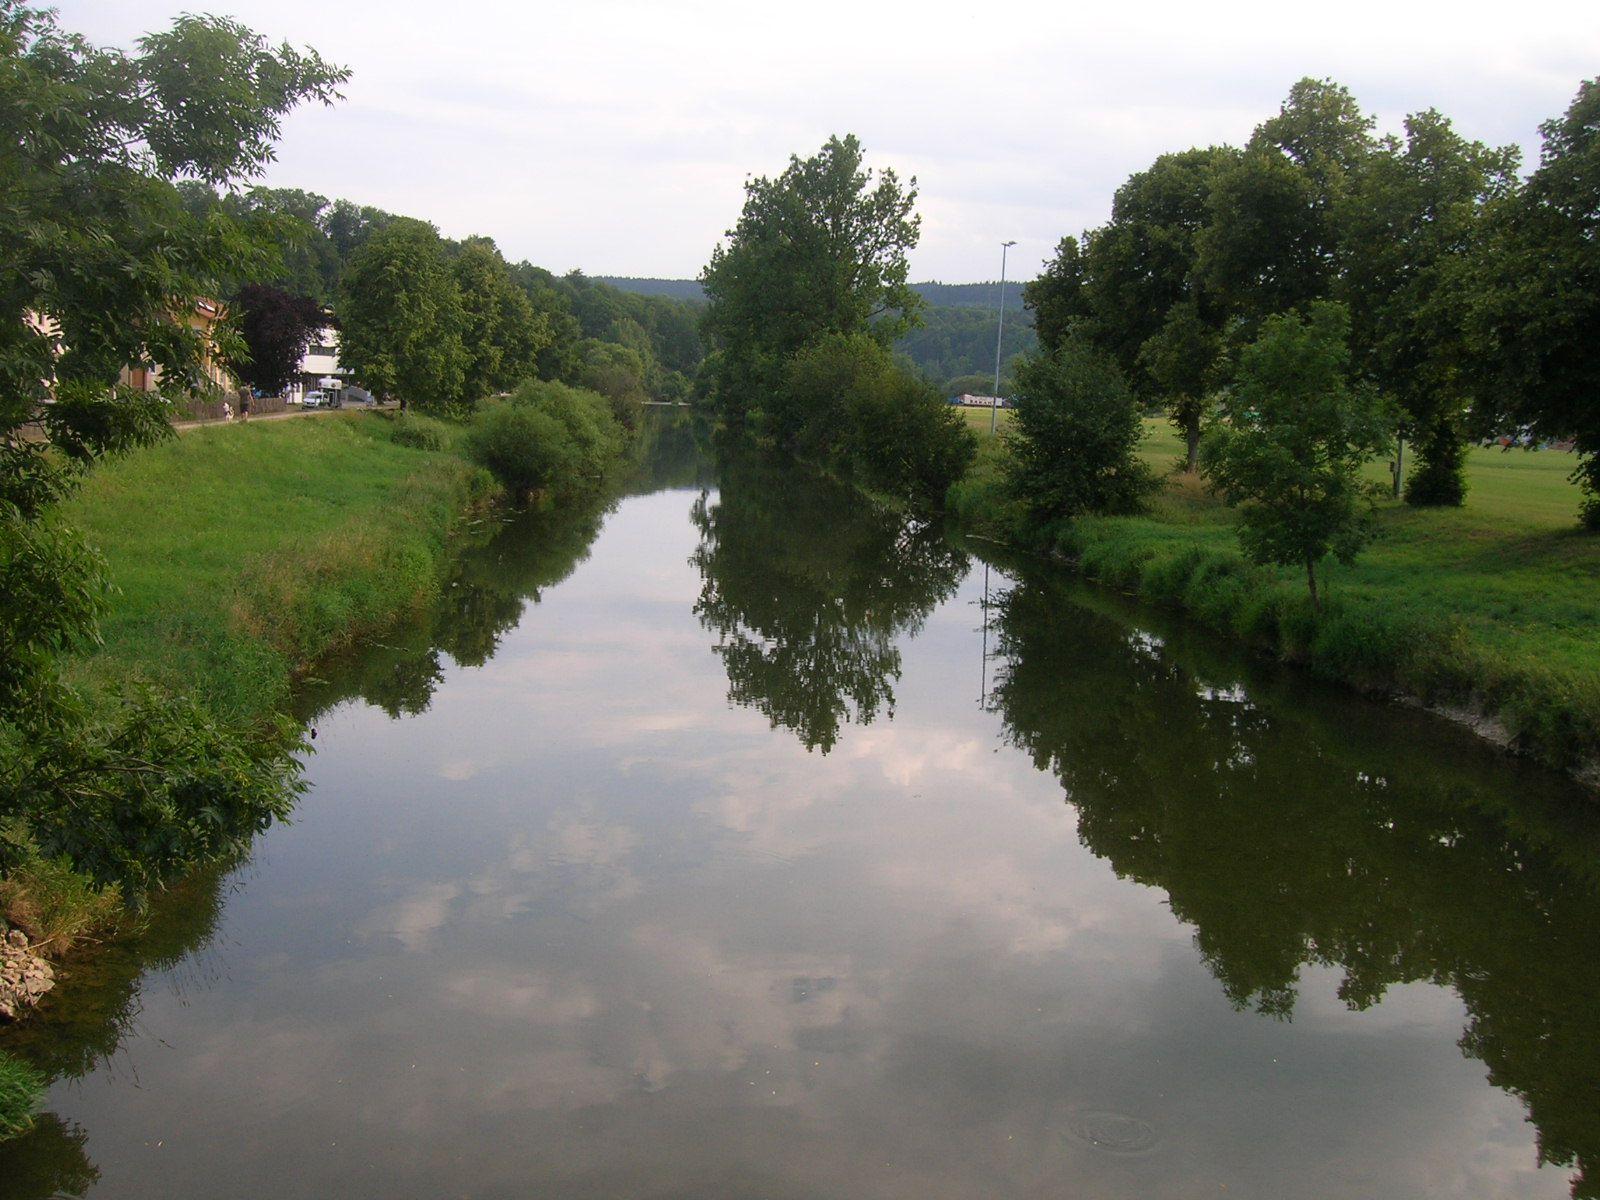 17 juillet 2013 - Fridingen